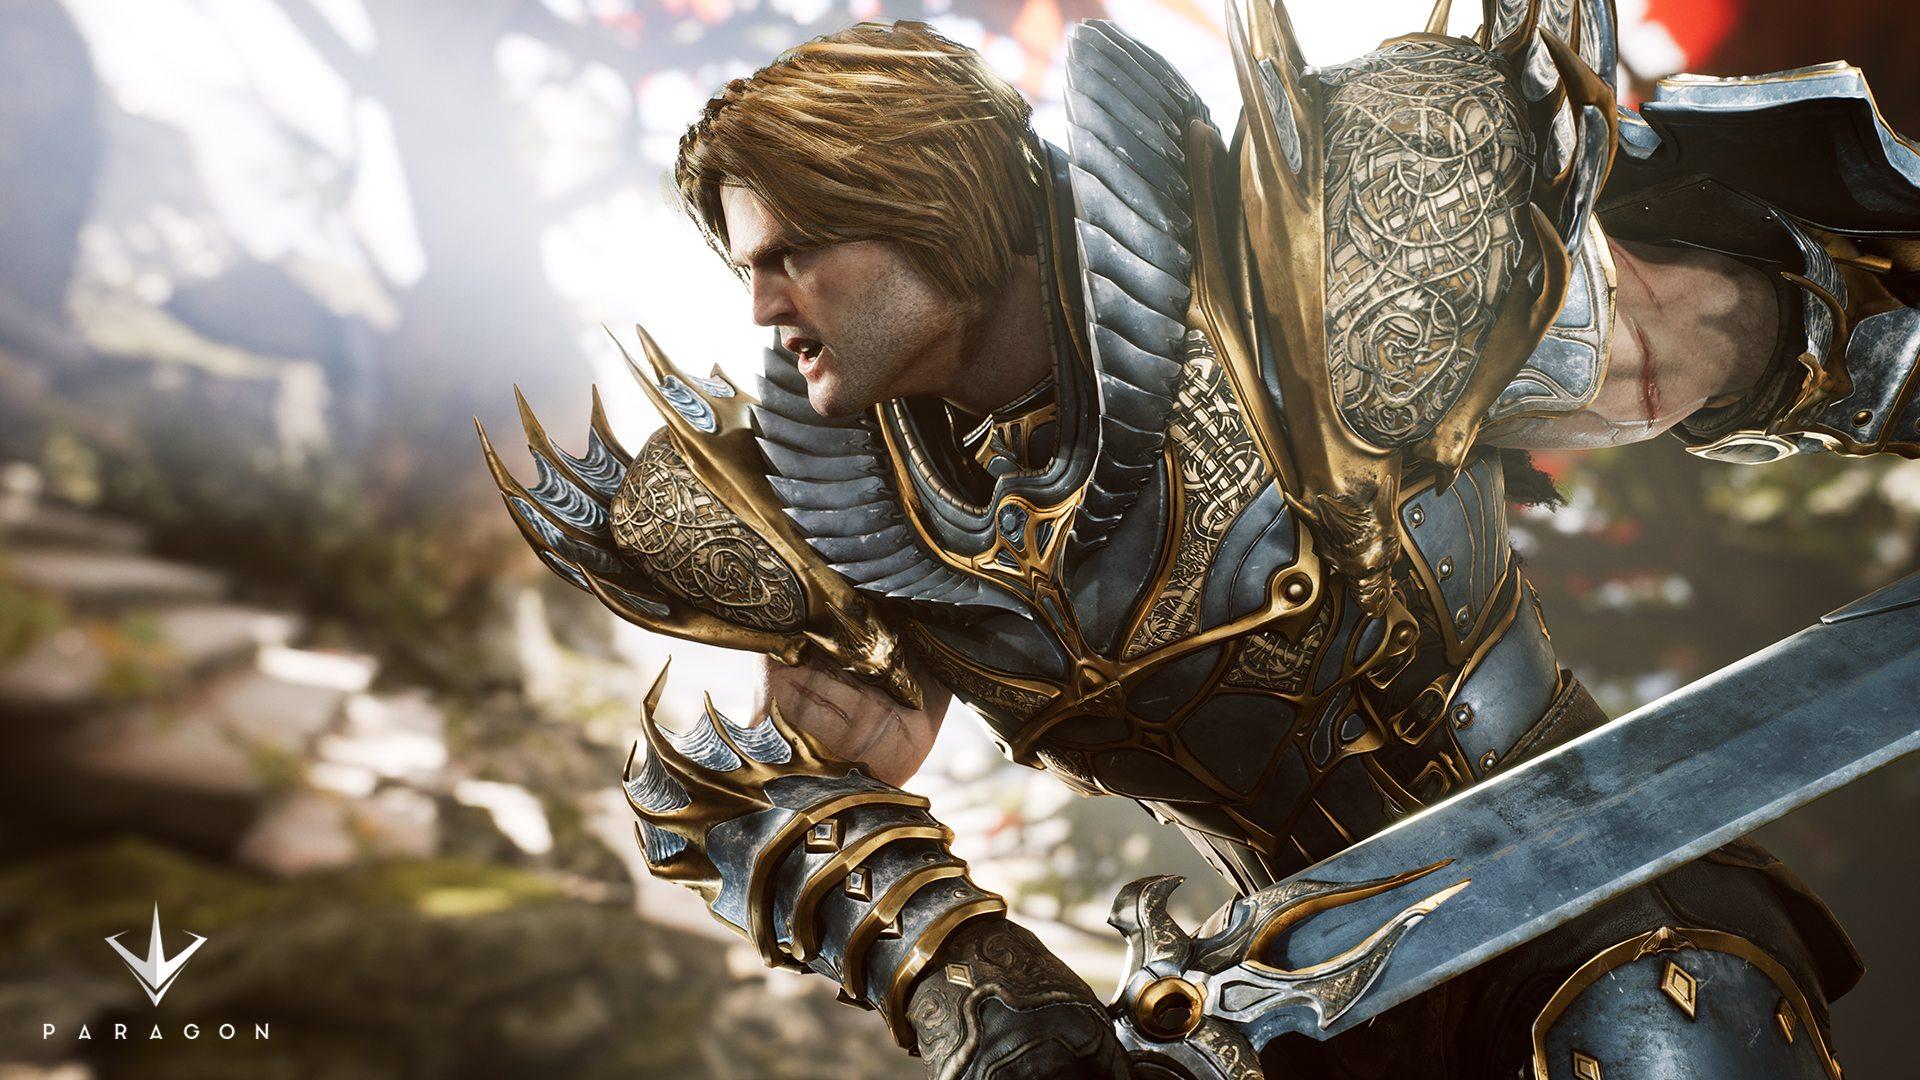 Paragon, Epic Games